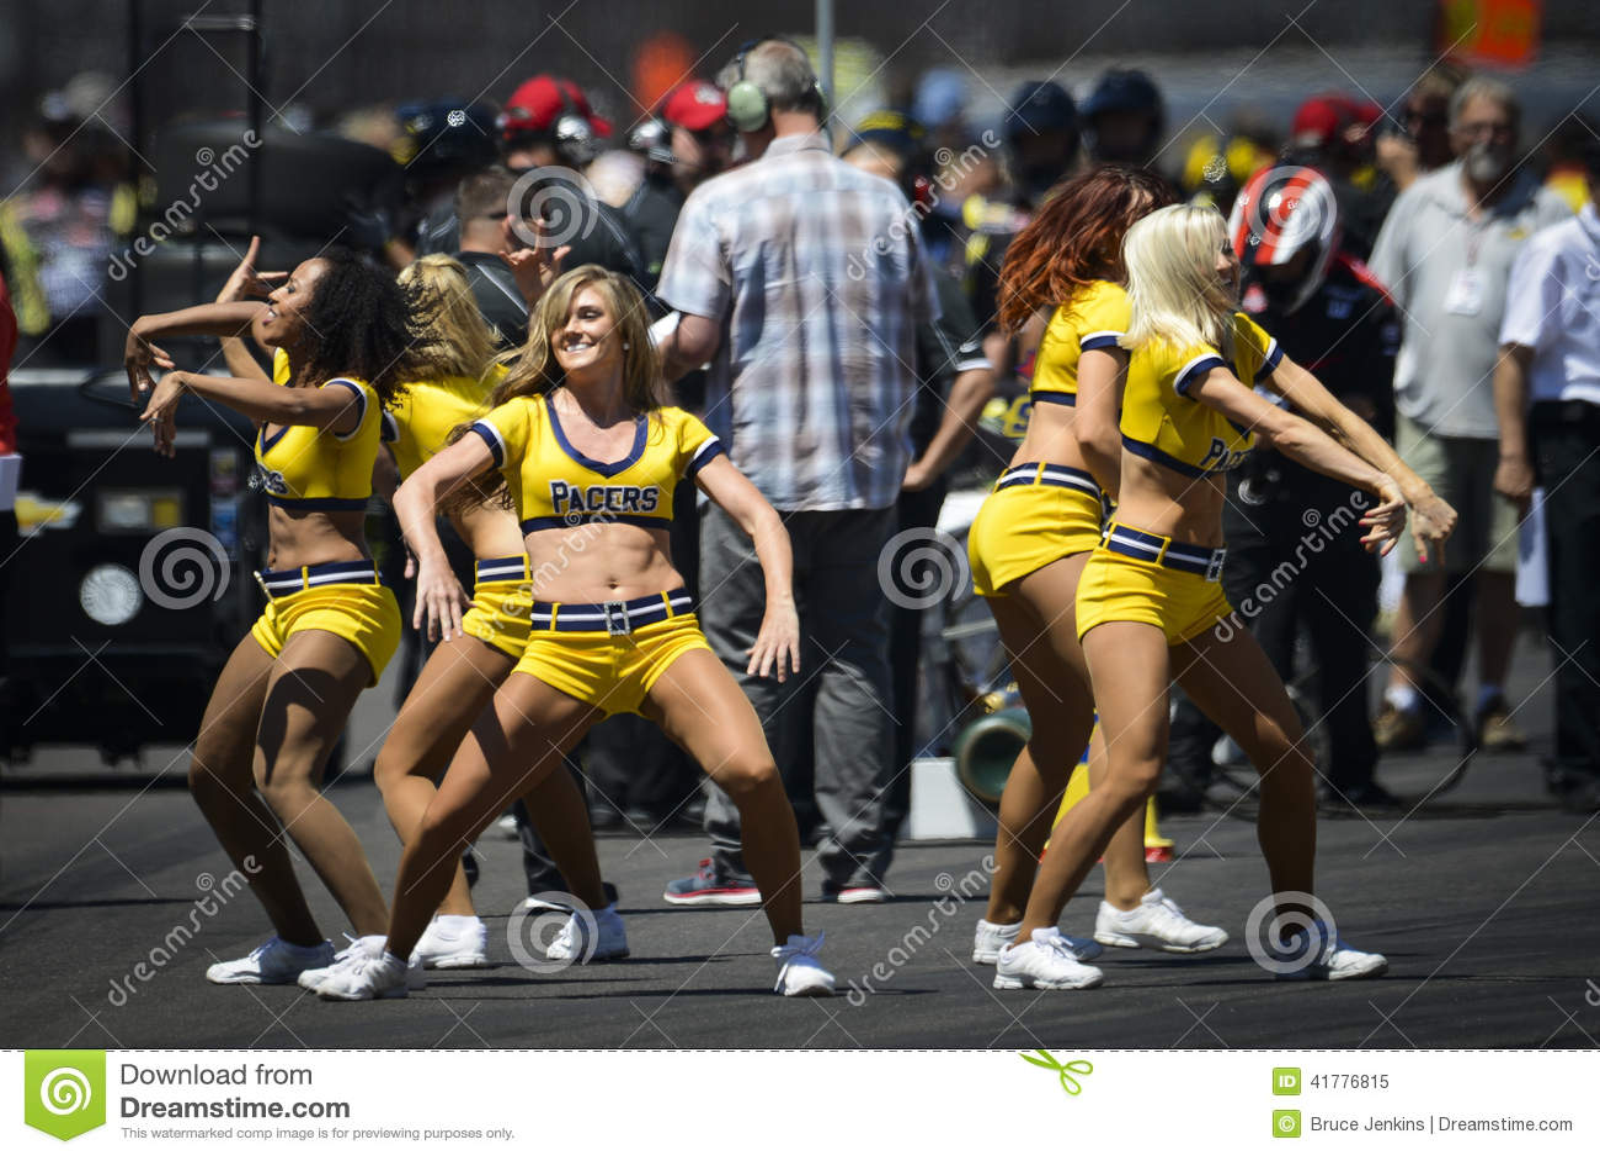 Cheerleadern im Indianapolis 500 2014